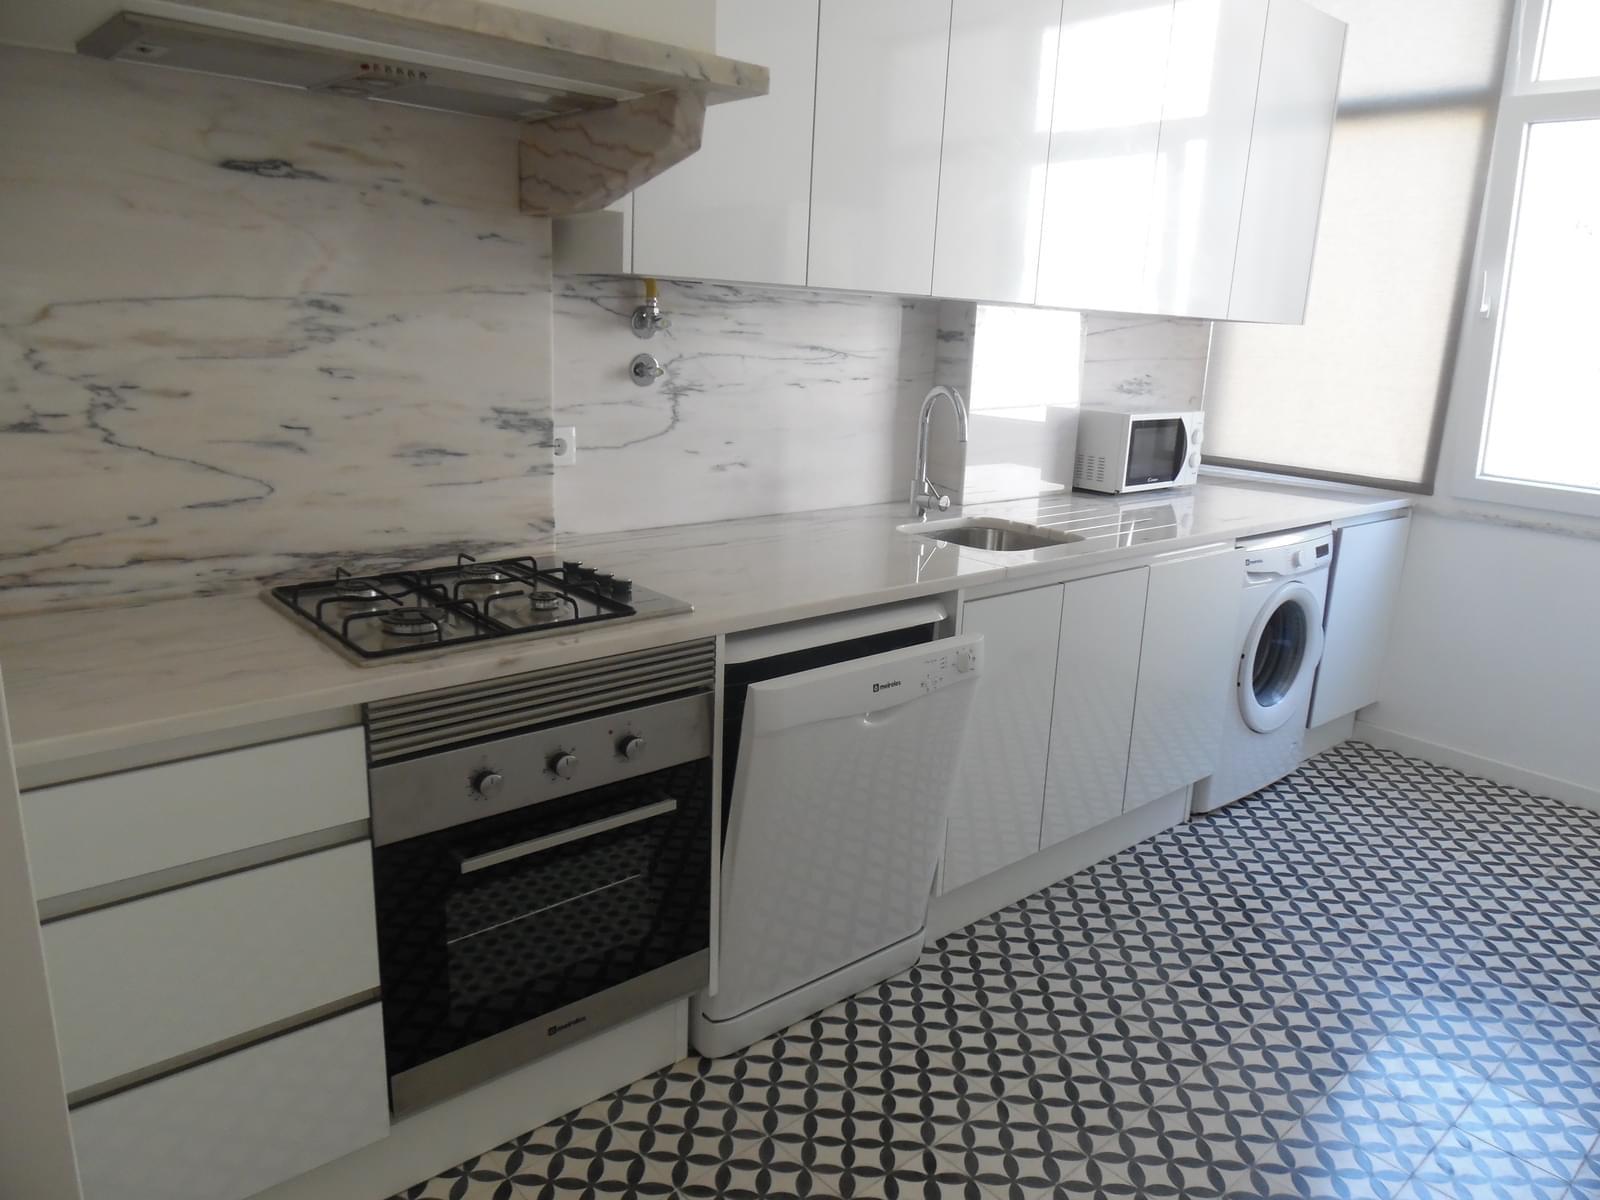 pf17256-apartamento-t2-lisboa-c1b265bc-5d21-4a9b-8b7a-01781f9cc8fe